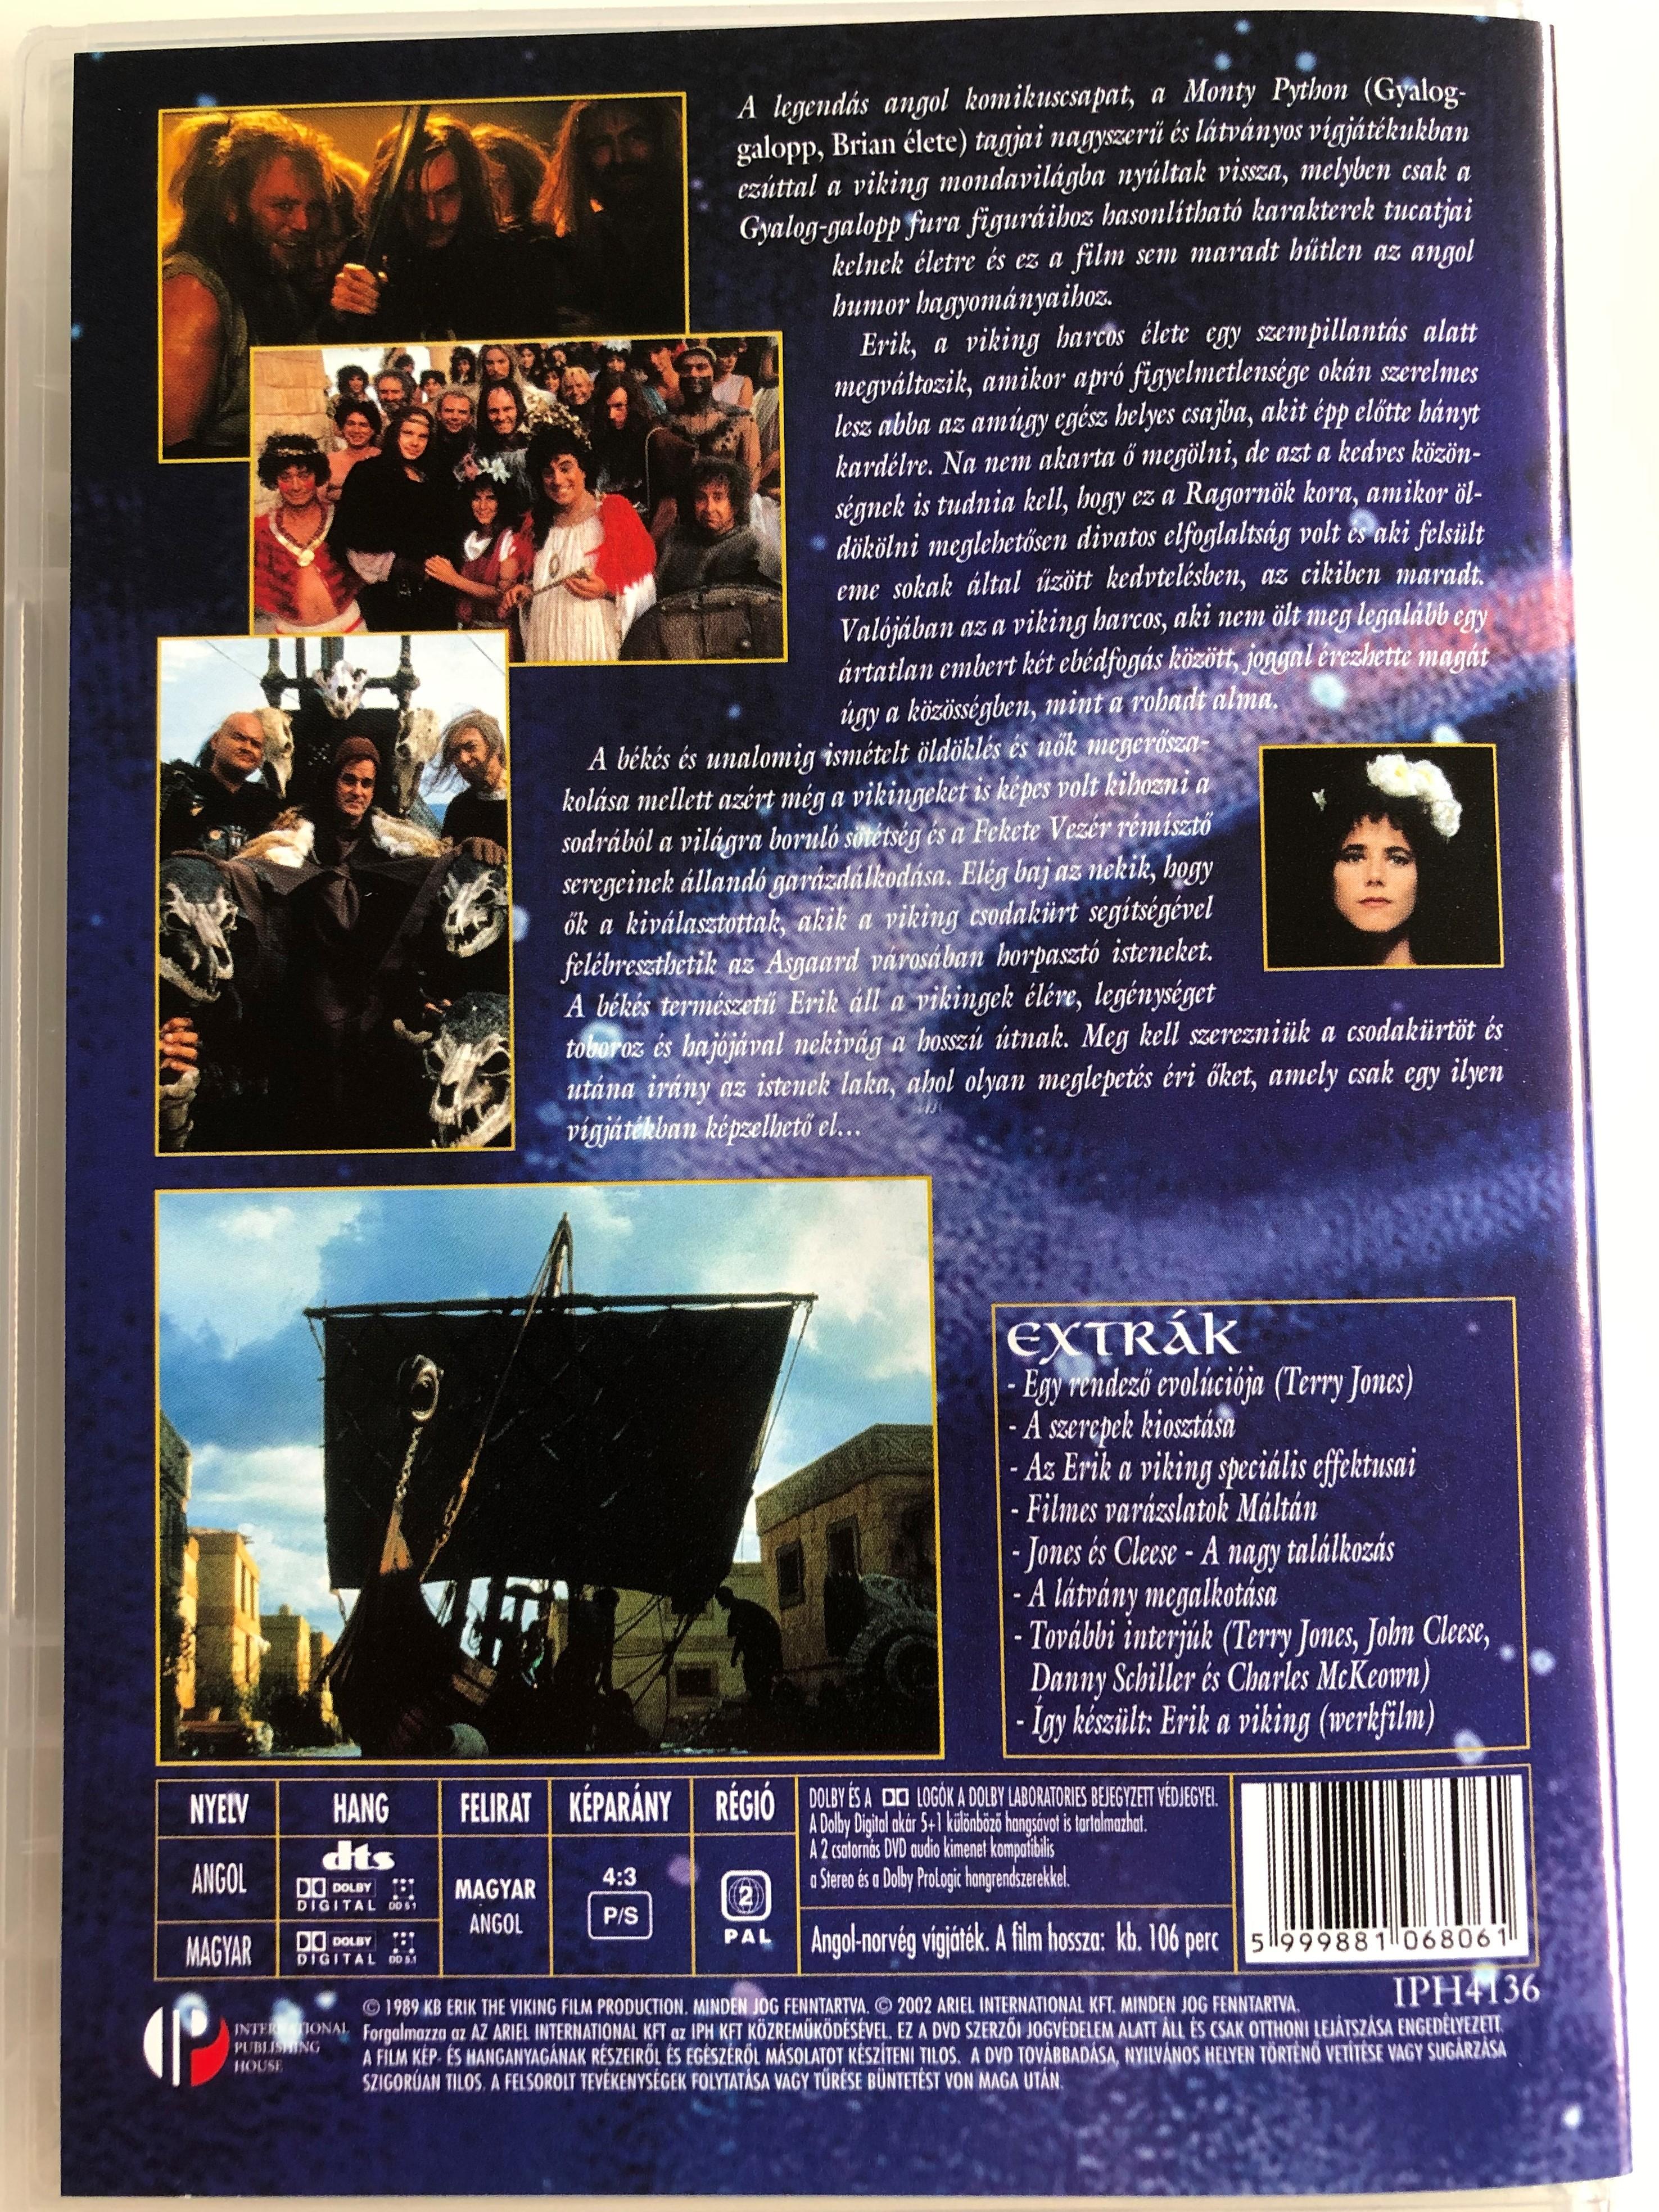 erik-the-viking-dvd-1989-erik-a-viking-directed-by-terry-jones-starring-tim-robbins-terry-jones-eartha-kitt-mickey-rooney-tsutomu-sekine-john-cleese-antony-sher-imogen-stubbs-2-.jpg